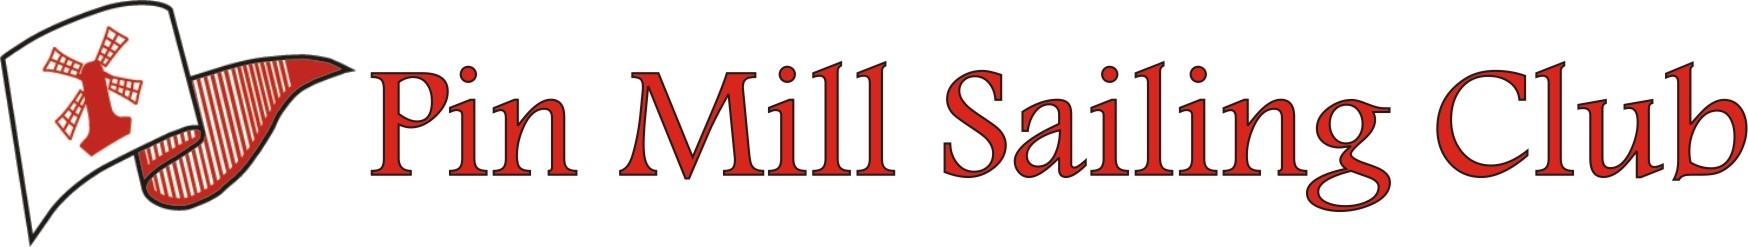 Pin Mill Sailing Club